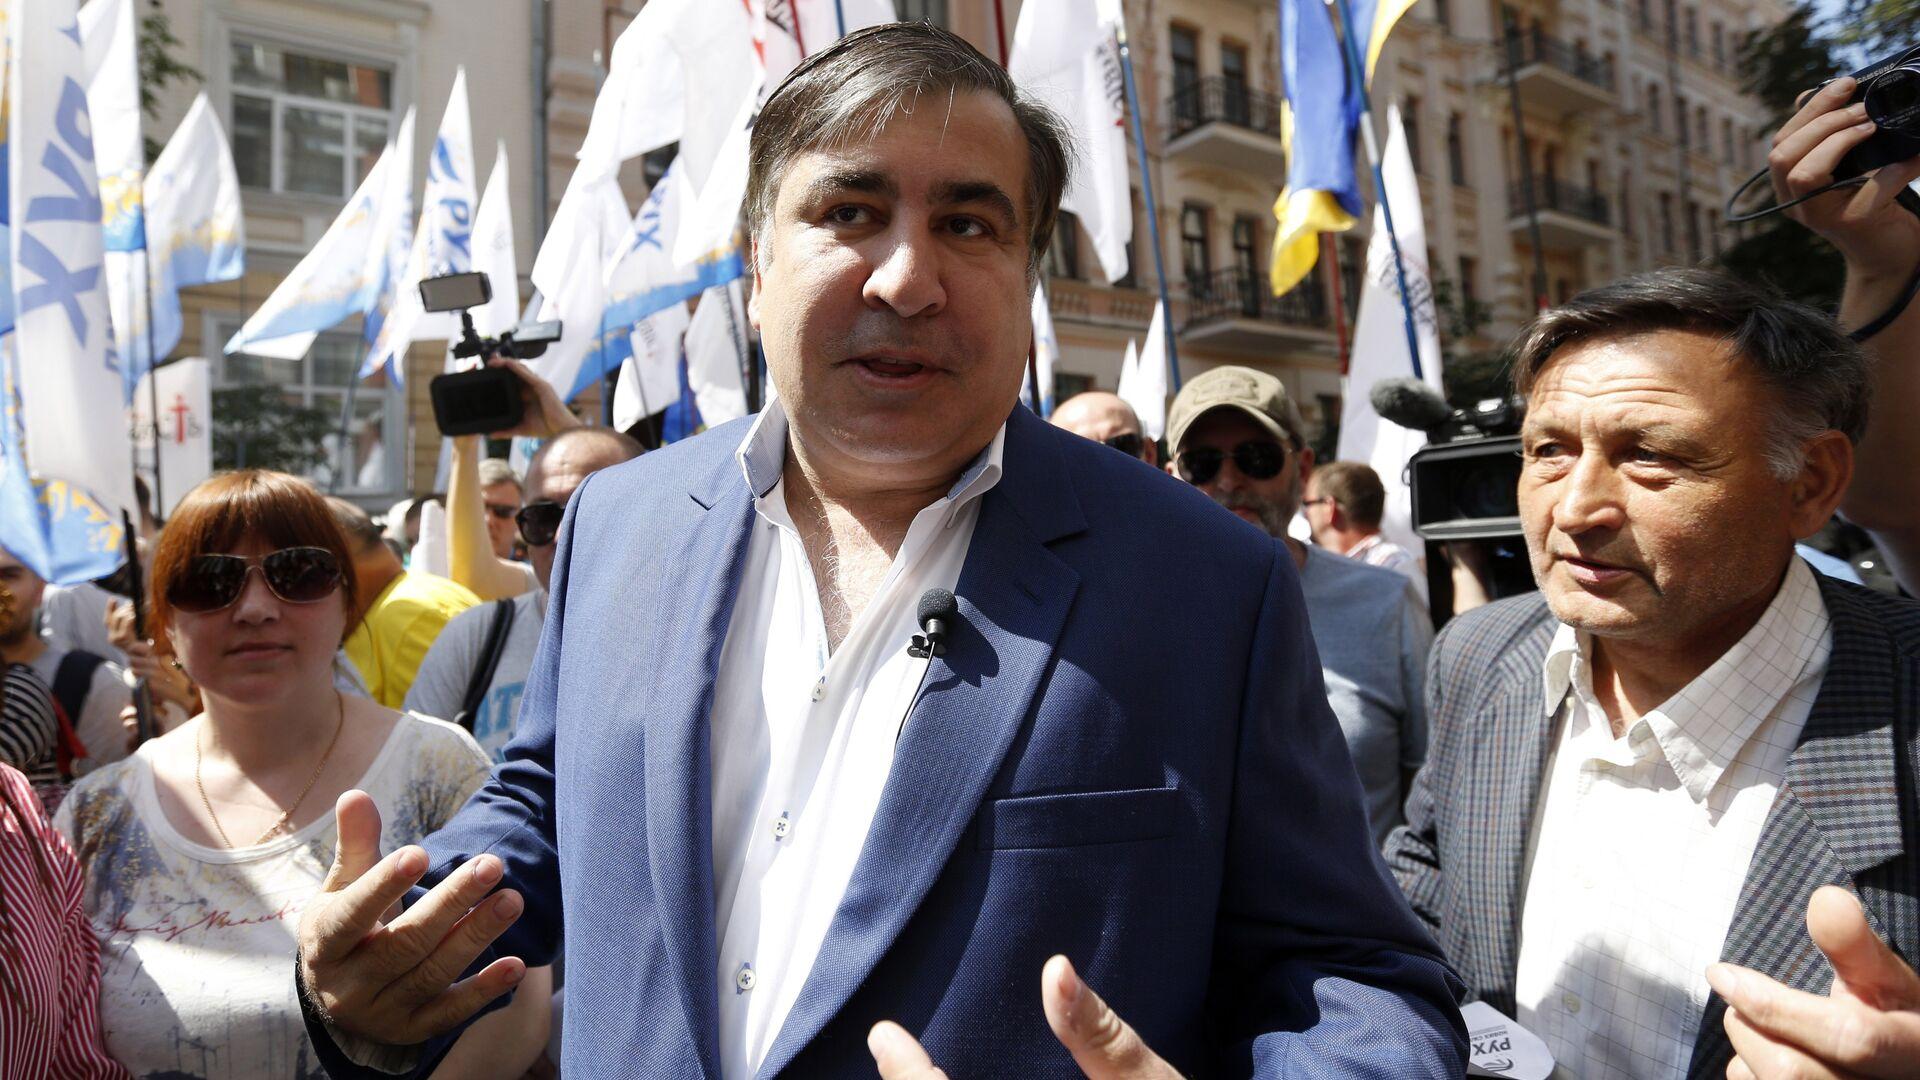 Экс-президент Грузии Михаил Саакашвили - Sputnik Грузия, 1920, 08.10.2021